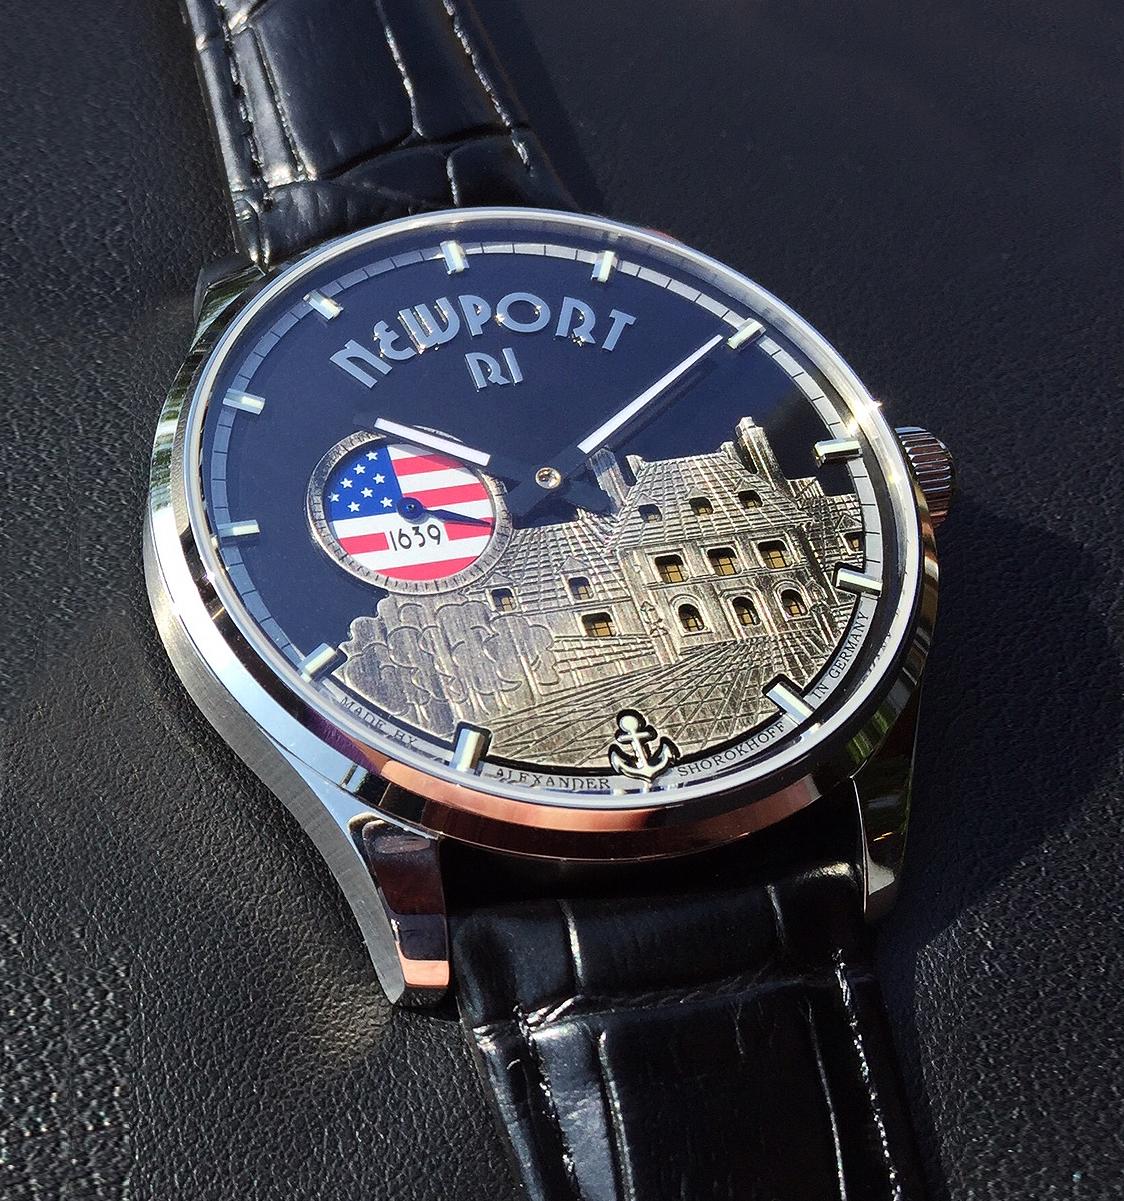 Alexander Shorokhoff Men's Newport watch, version one.